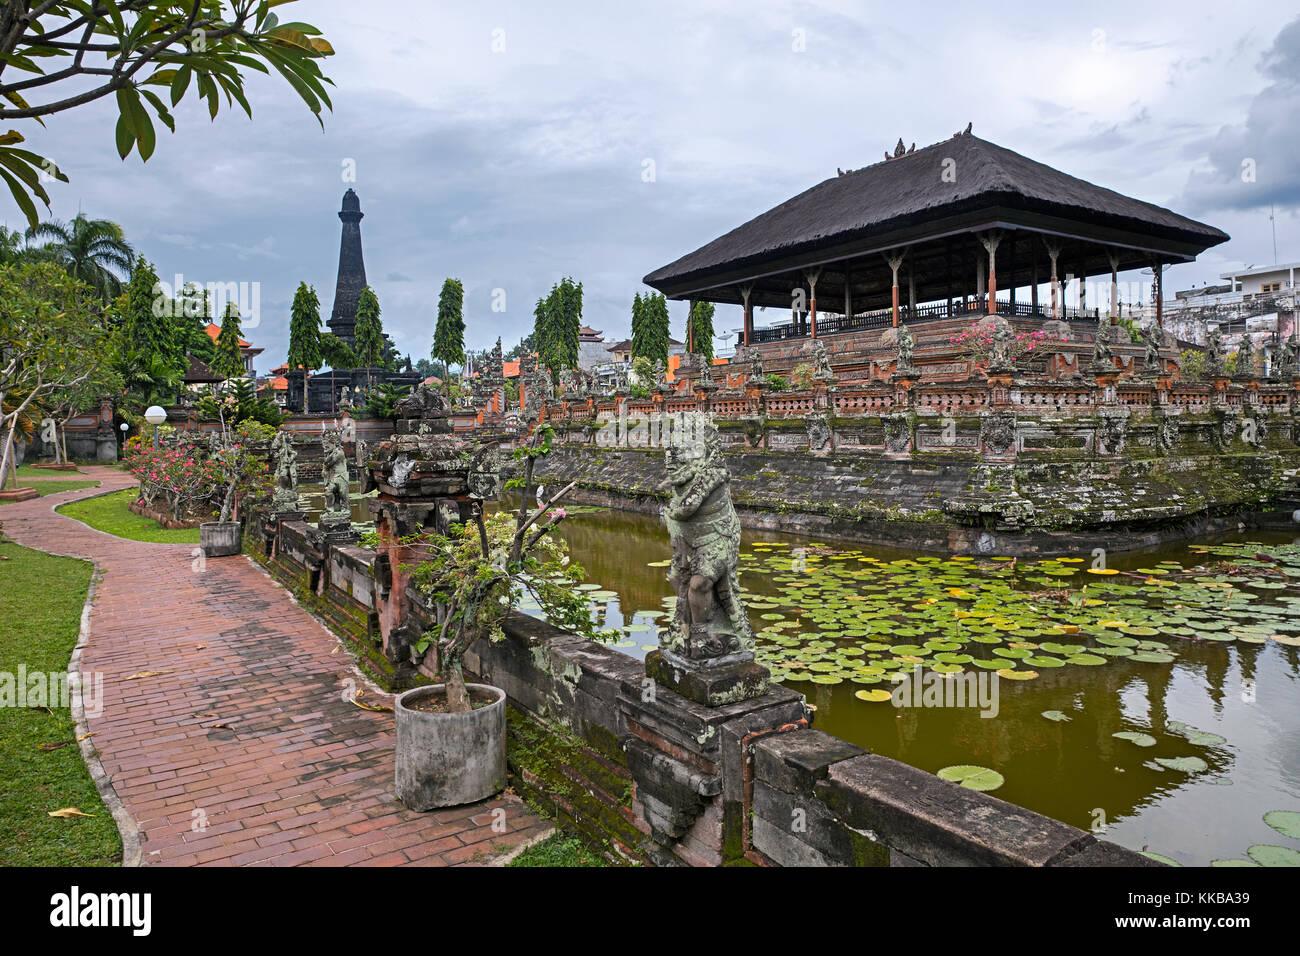 Kertha Gosa Pavilion of Klungkung Palace / Puri Agung Semarapura in the city Semarapura on the island Bali, Indonesia - Stock Image